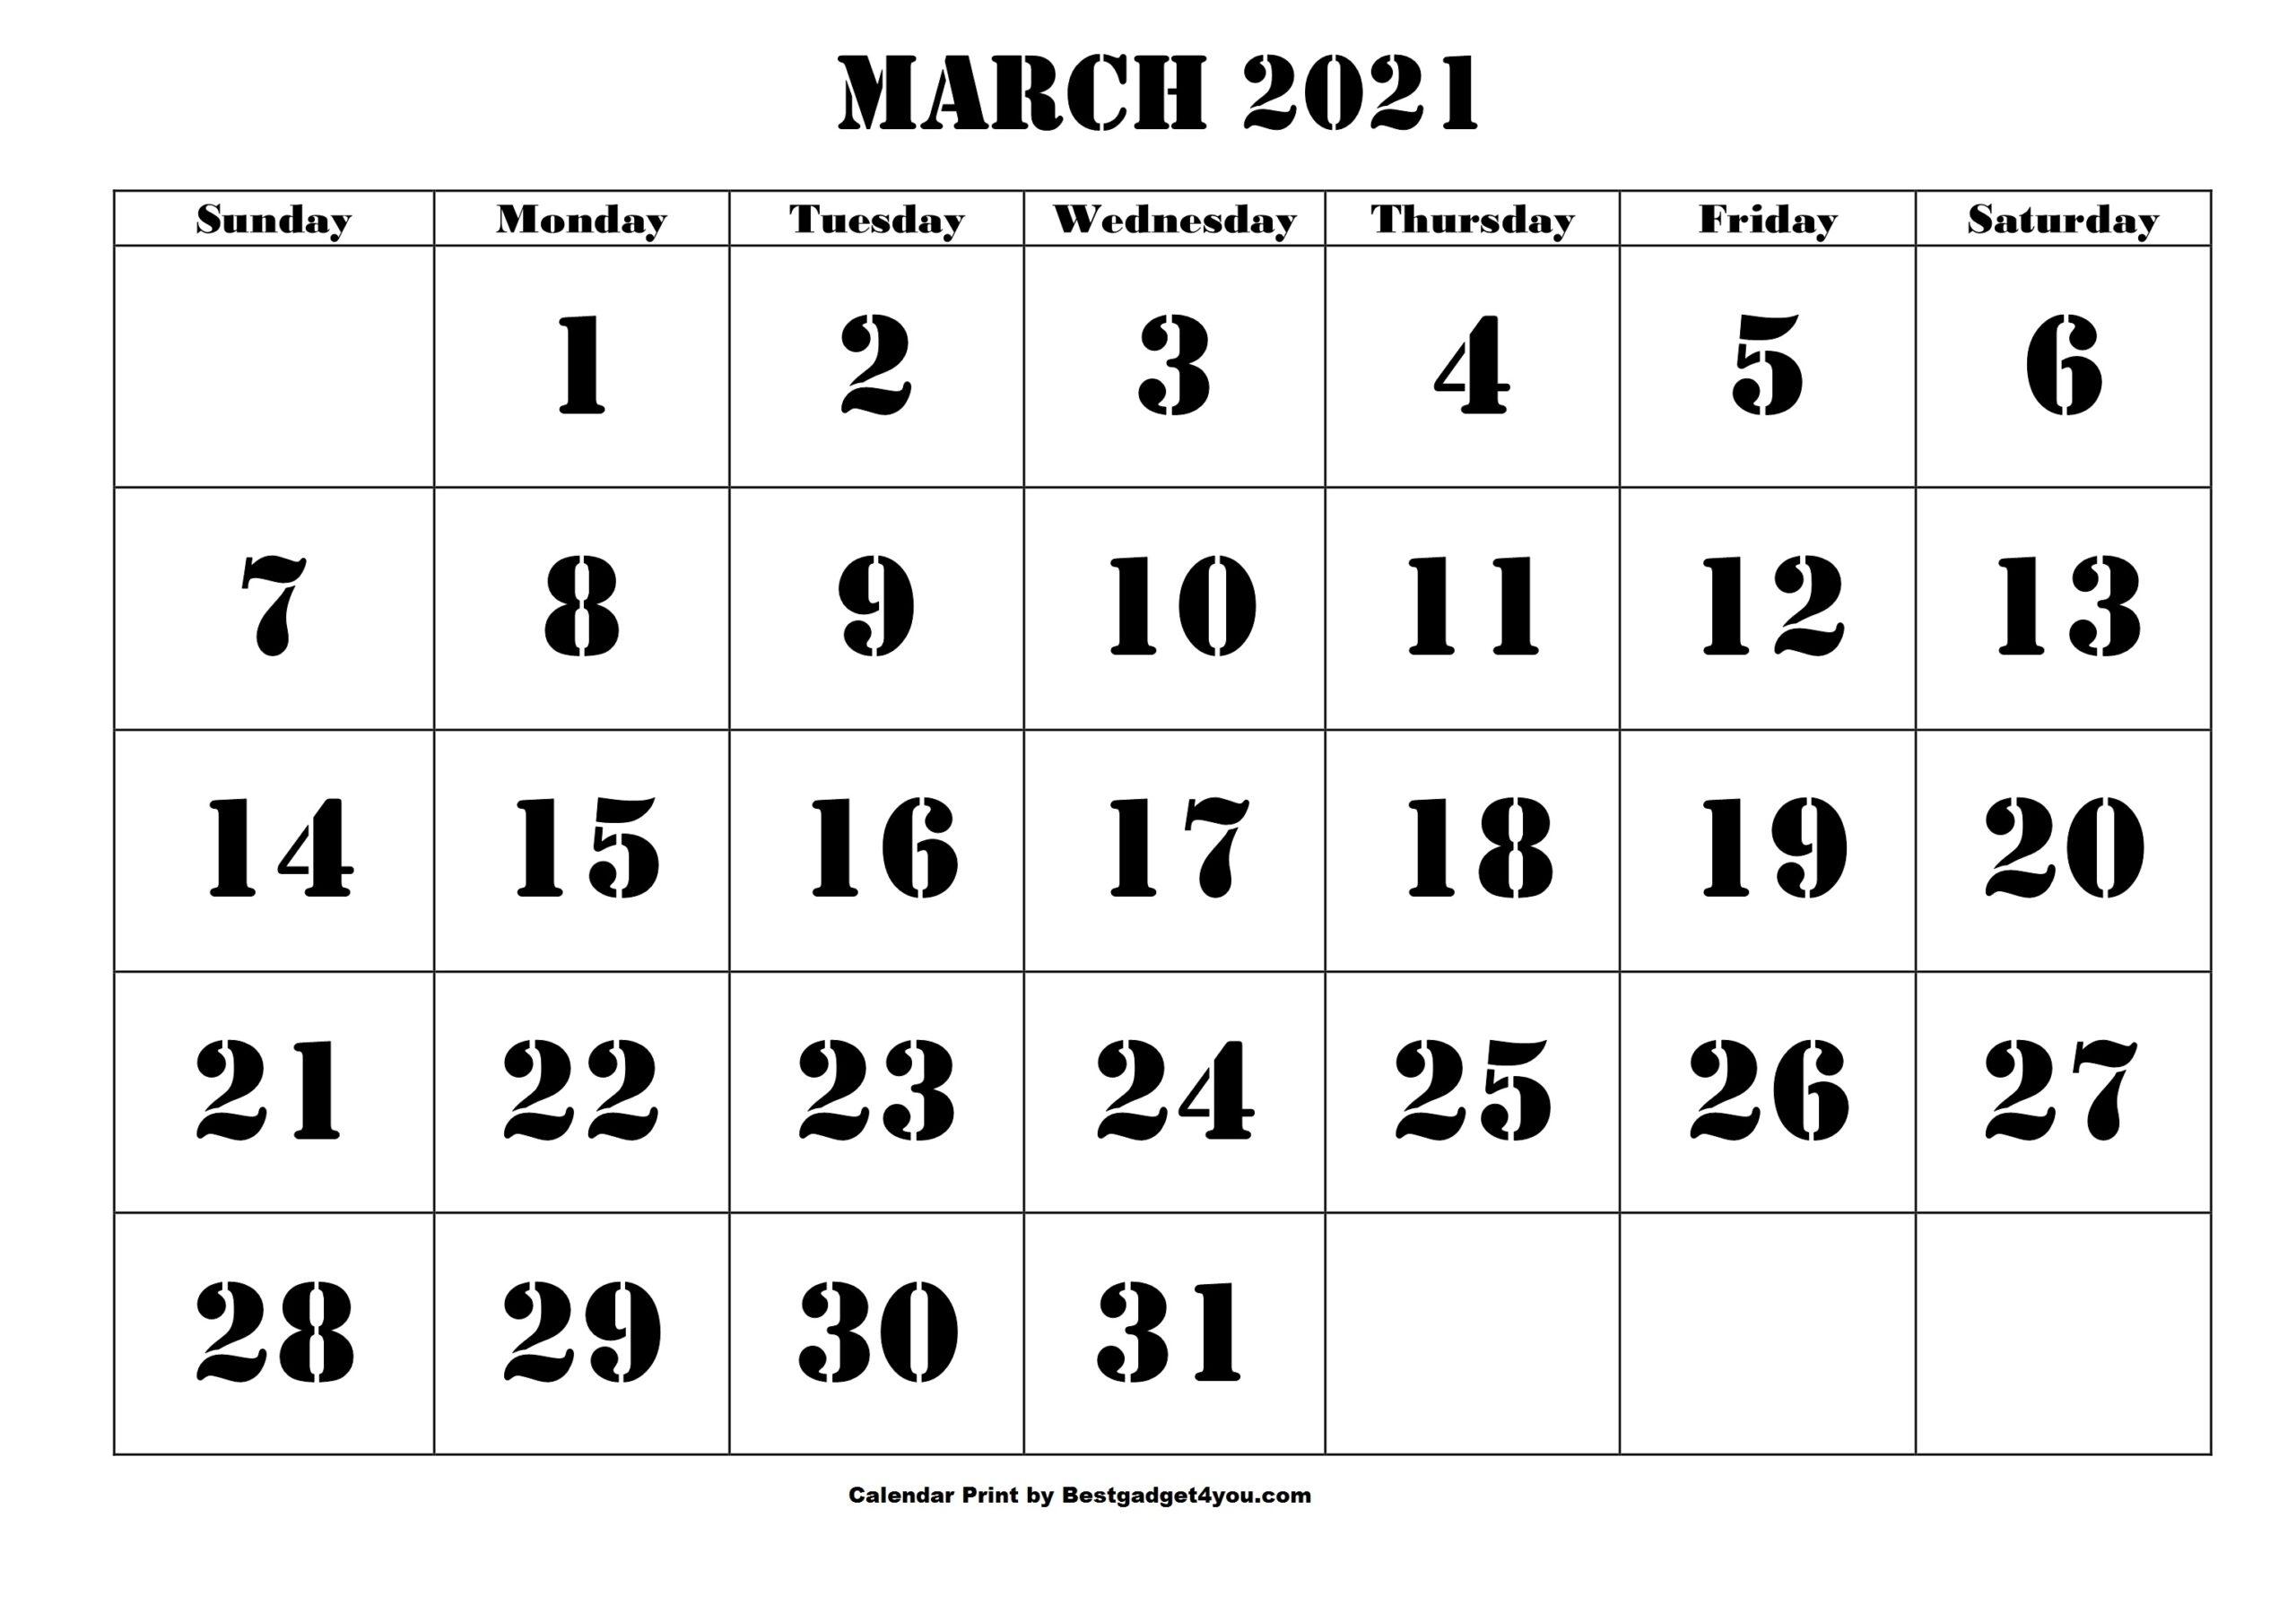 Printable March 2021 Calendar - Bestgadget4You